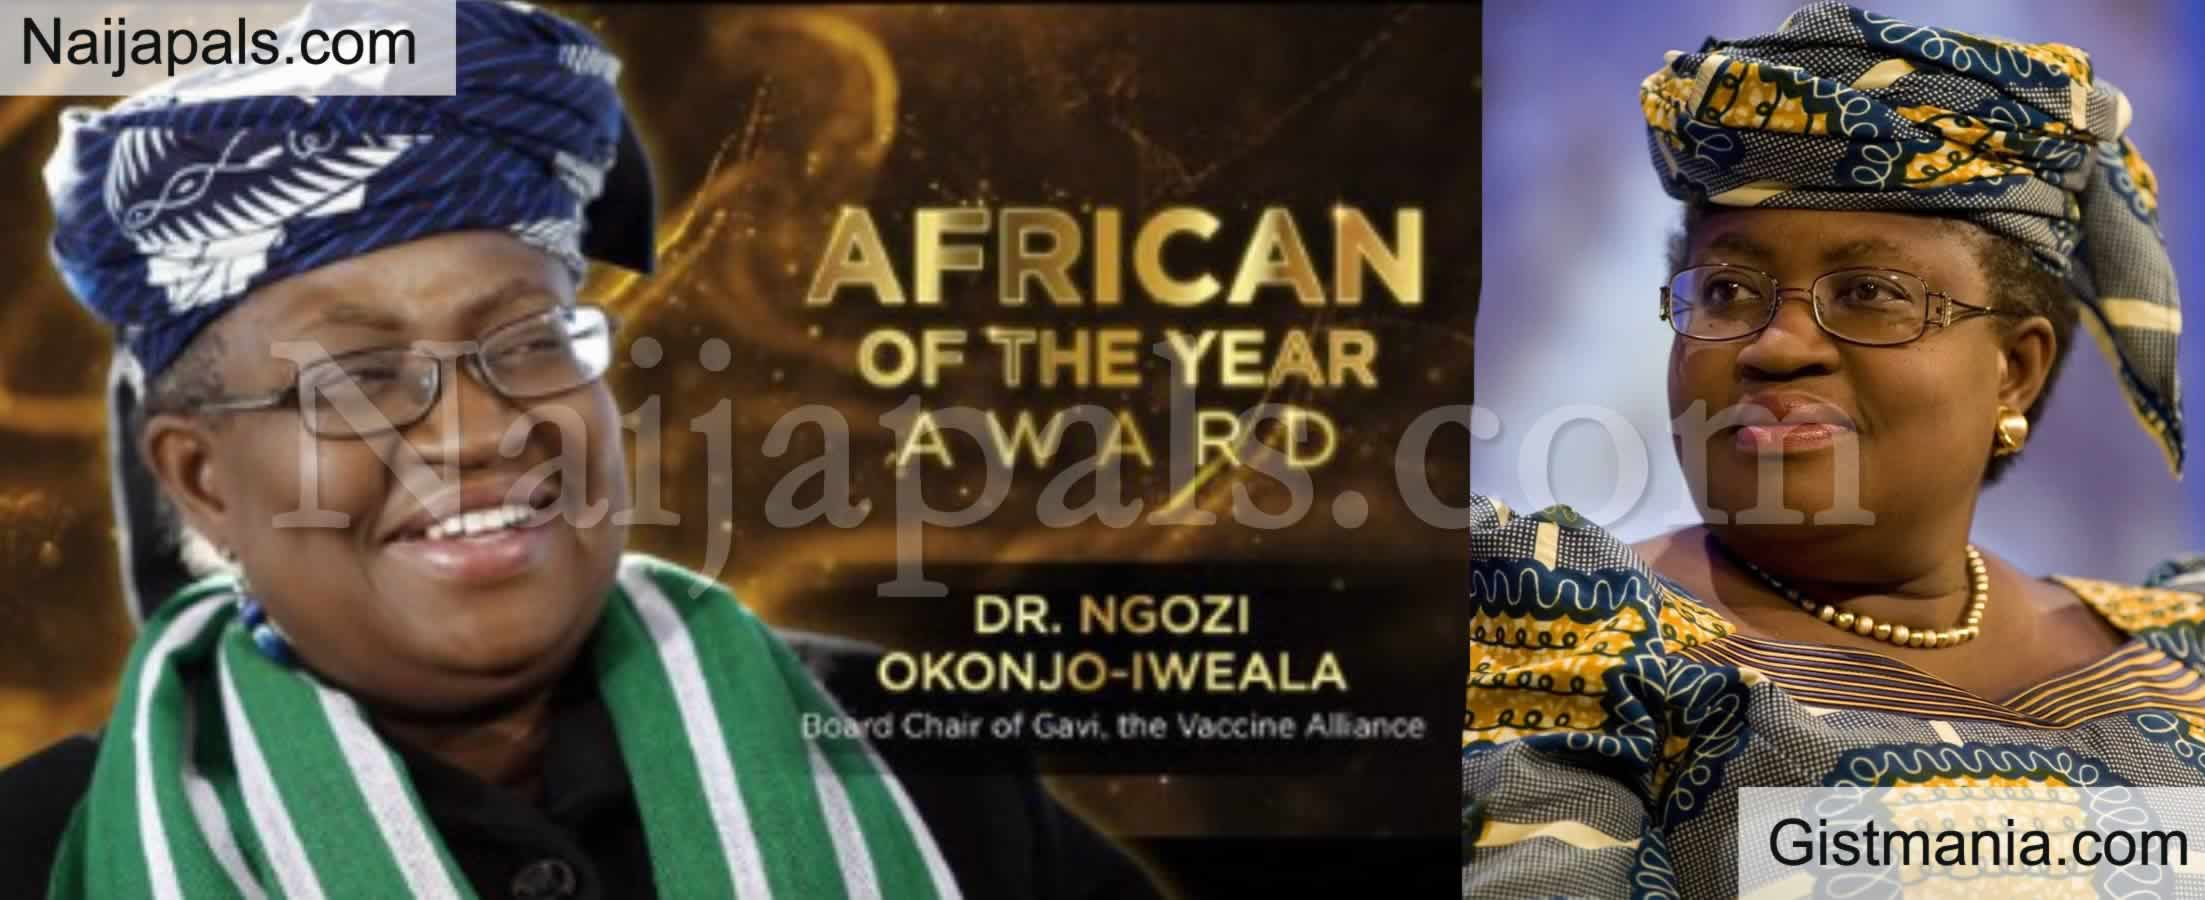 <img alt='.' class='lazyload' data-src='https://img.gistmania.com/emot/thumbs_up.gif' /> <b>Nigeria's Ngozi Okonjo Iweala Emerges Forbes Africa Person of Year 2020</b>